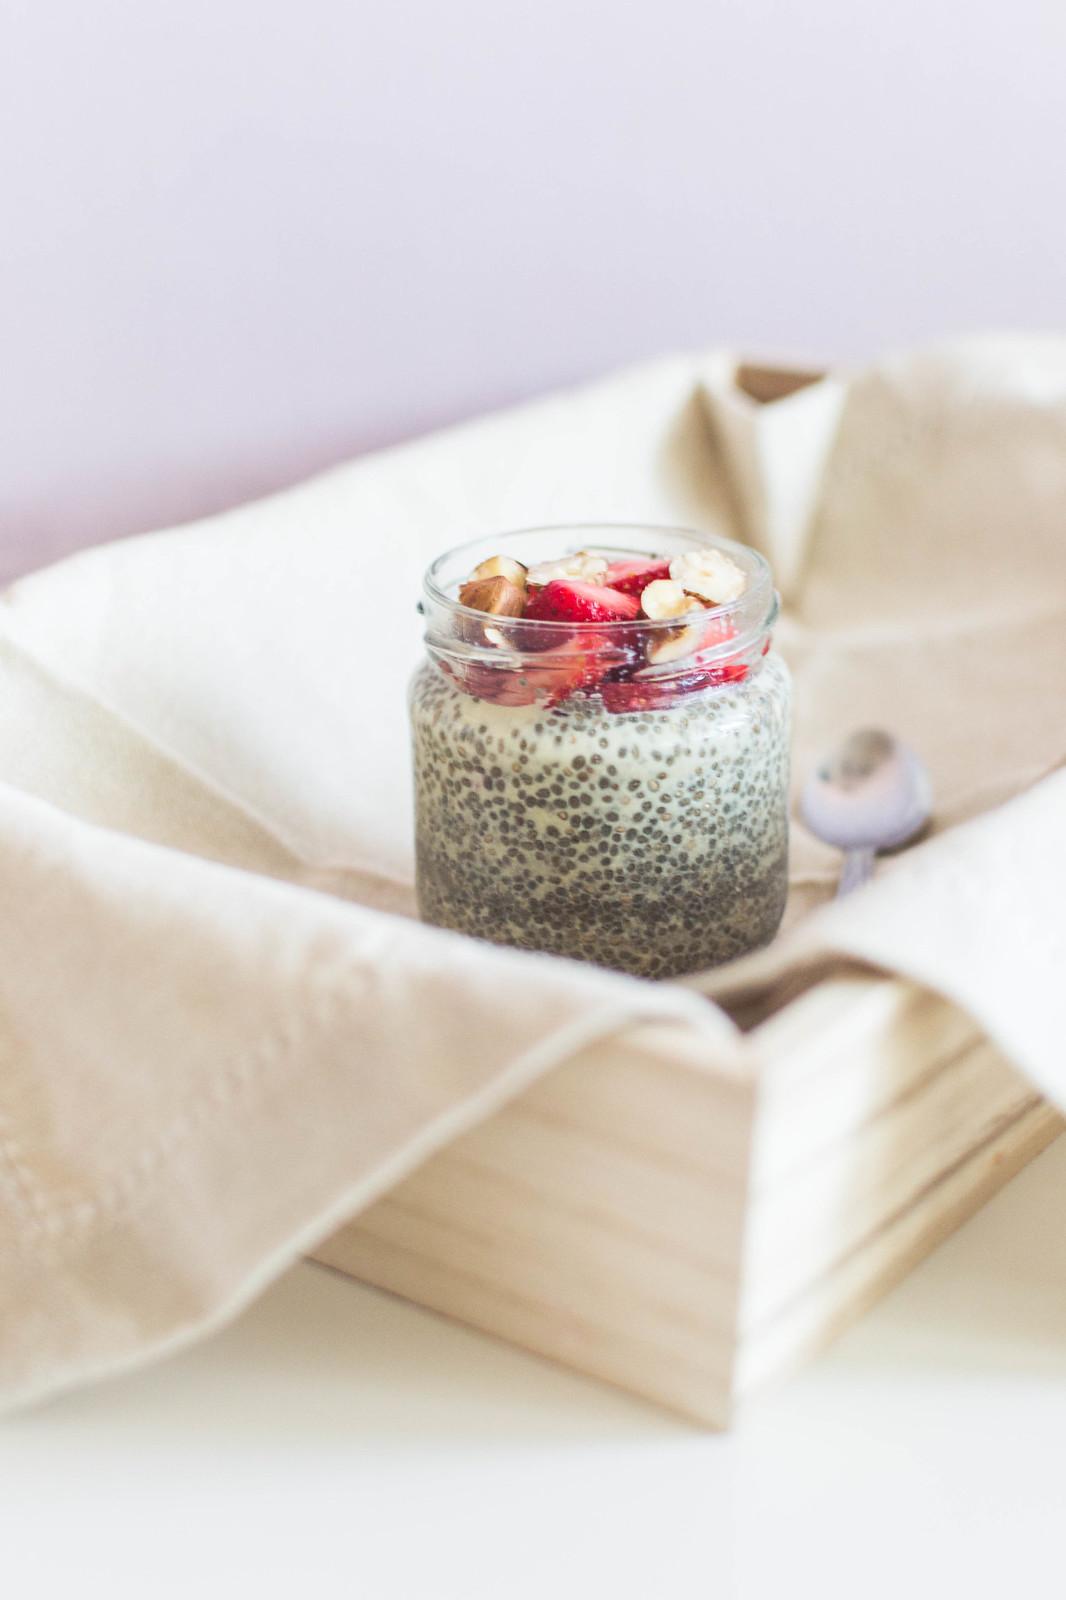 The Breakfast Jar